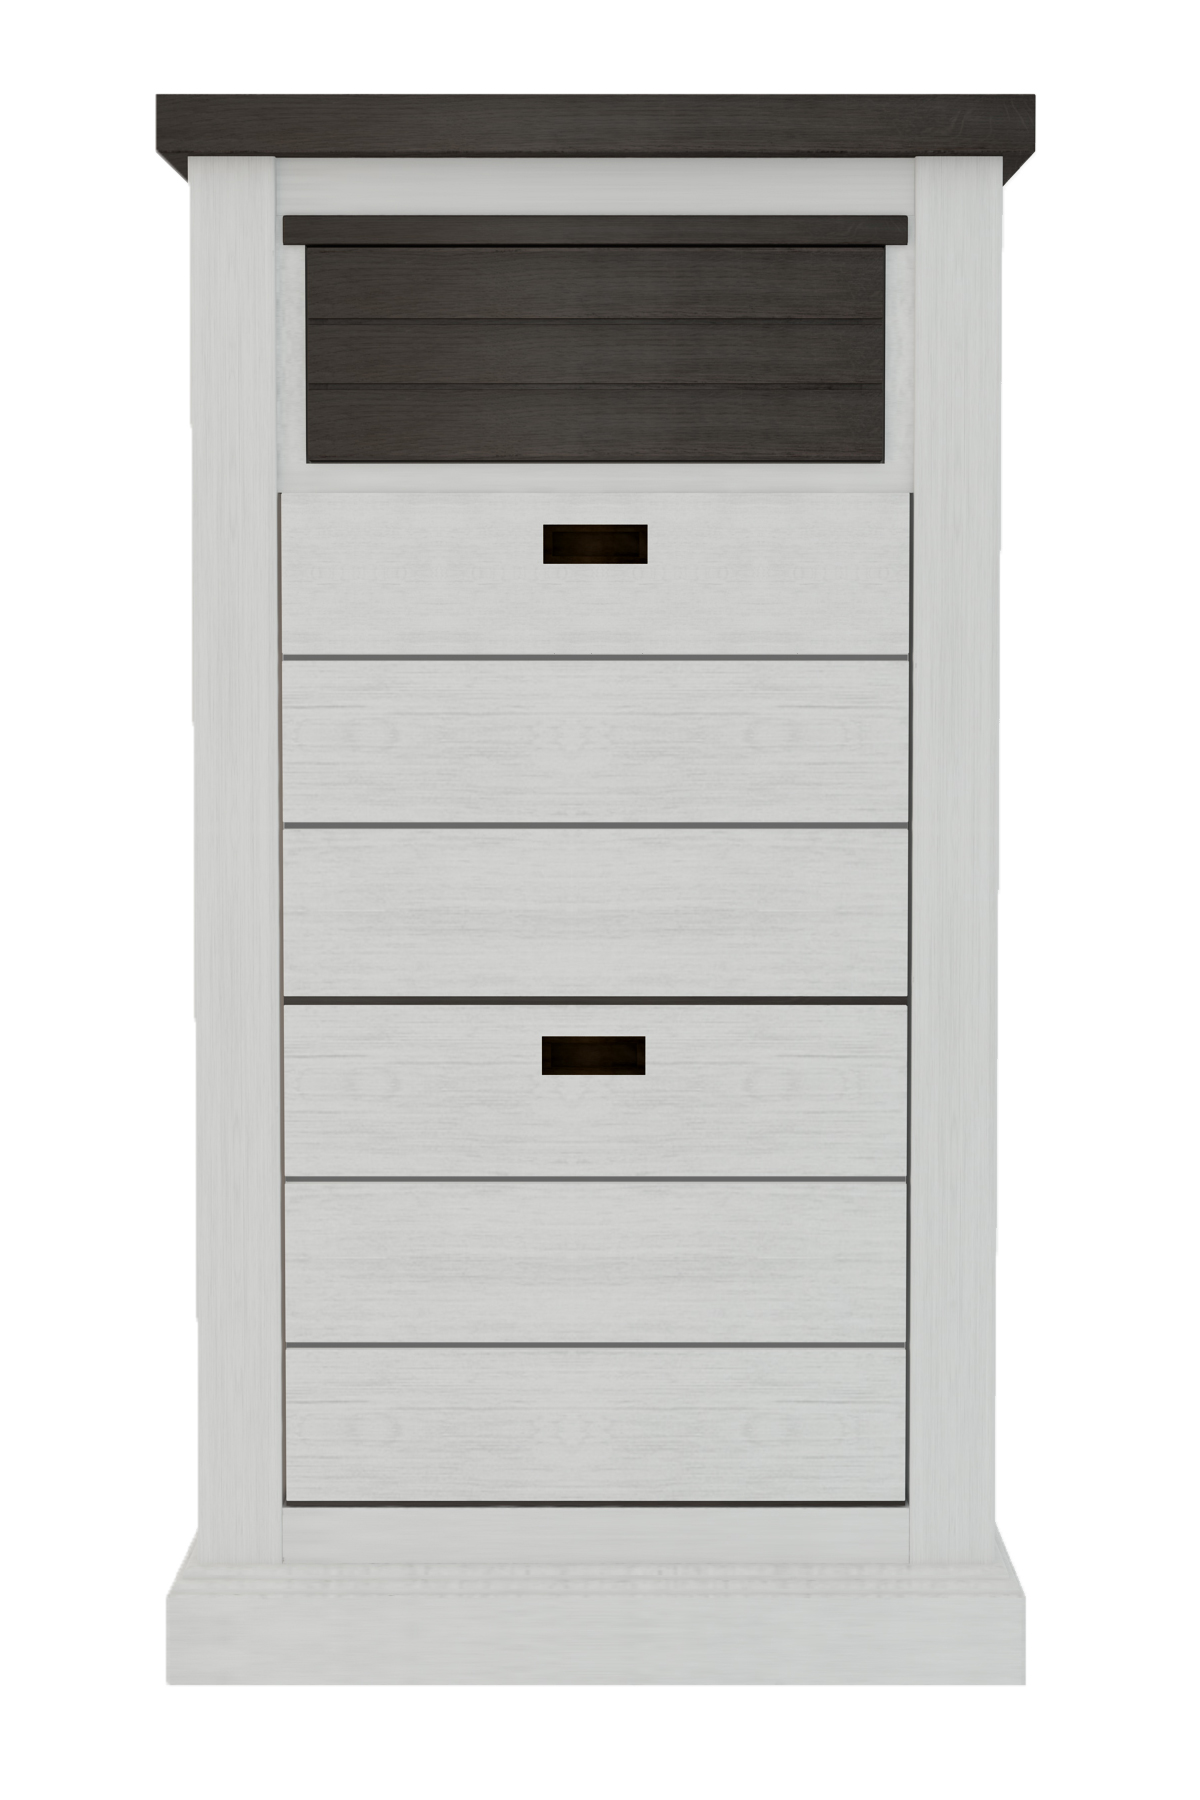 garderobe loft massive akazie ideal group m bel letz ihr online shop. Black Bedroom Furniture Sets. Home Design Ideas